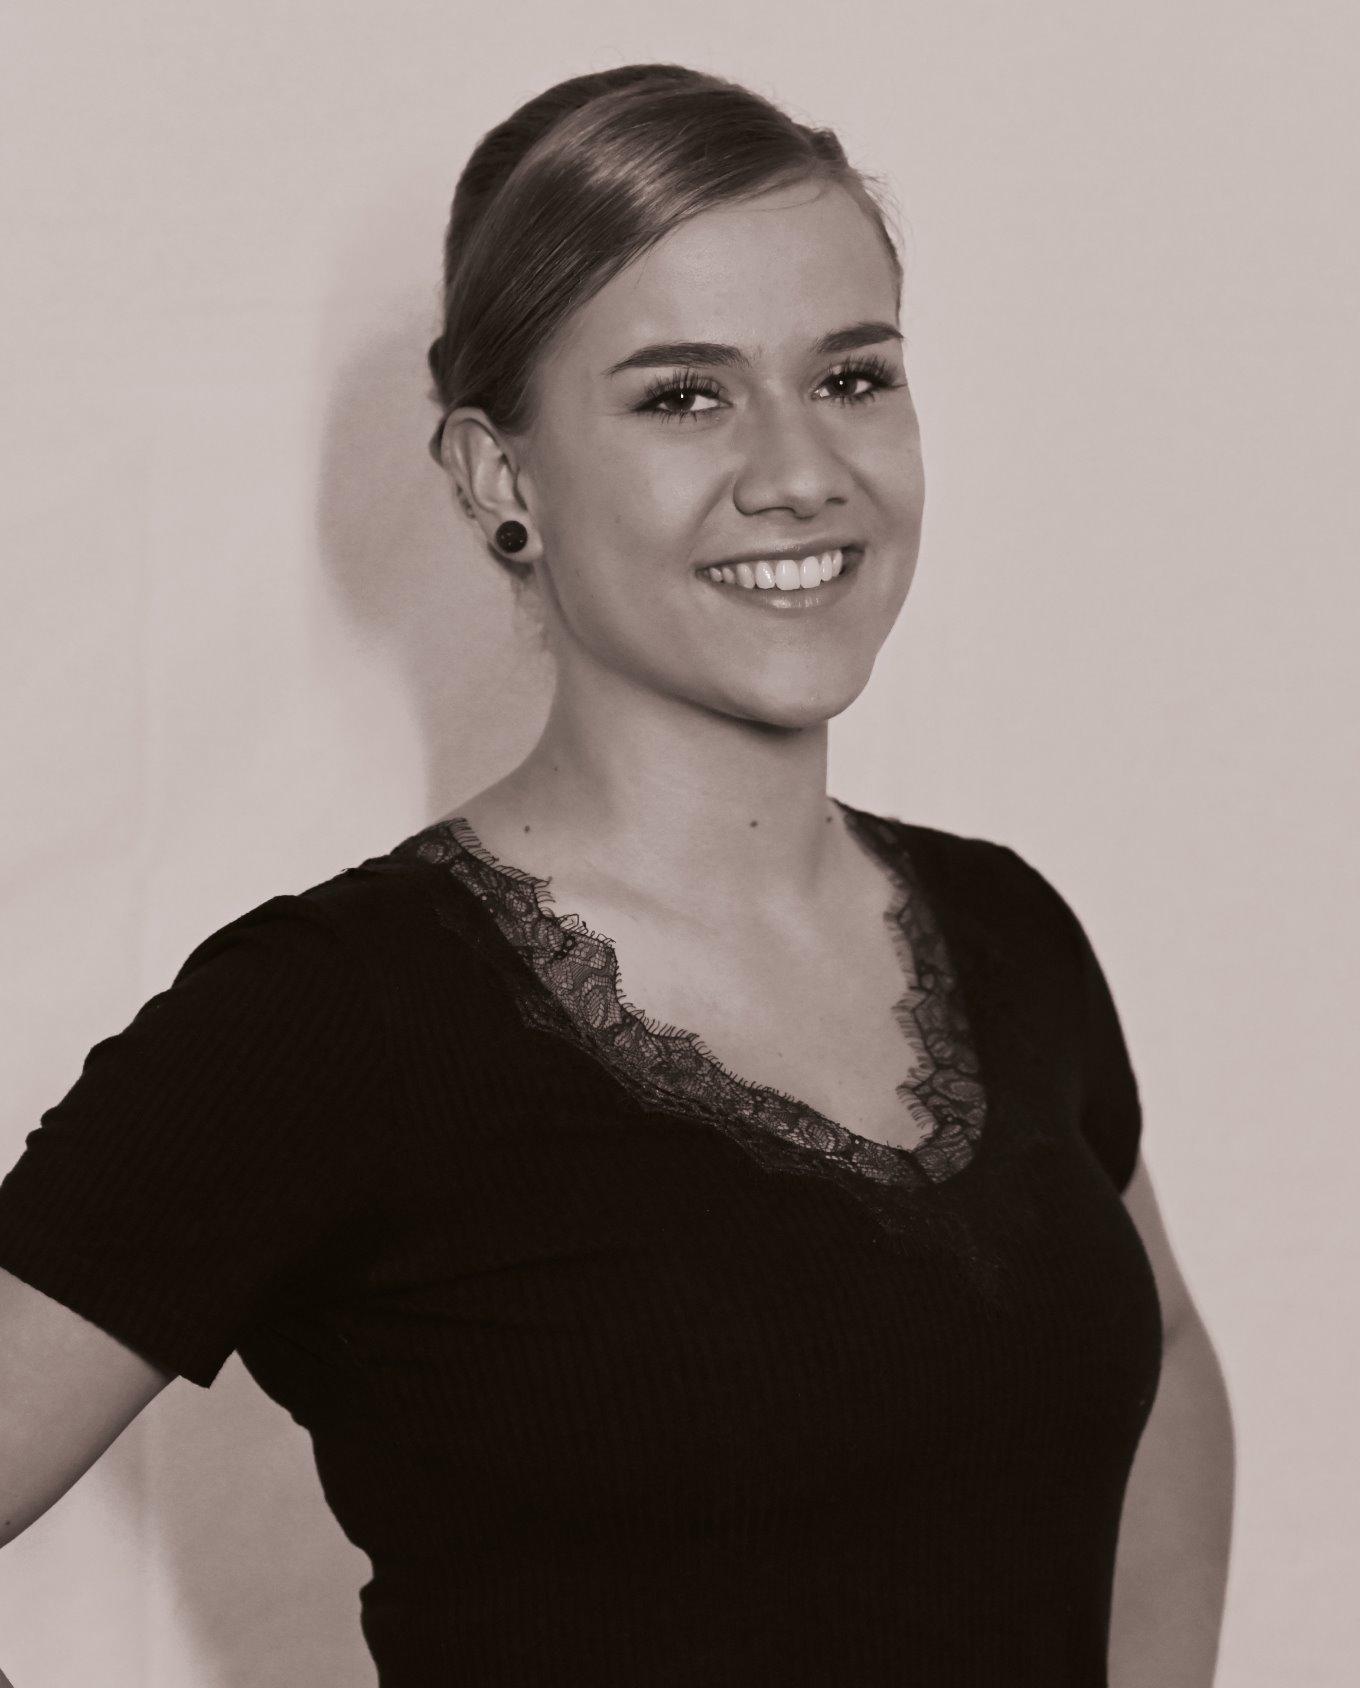 Roswitha Schels